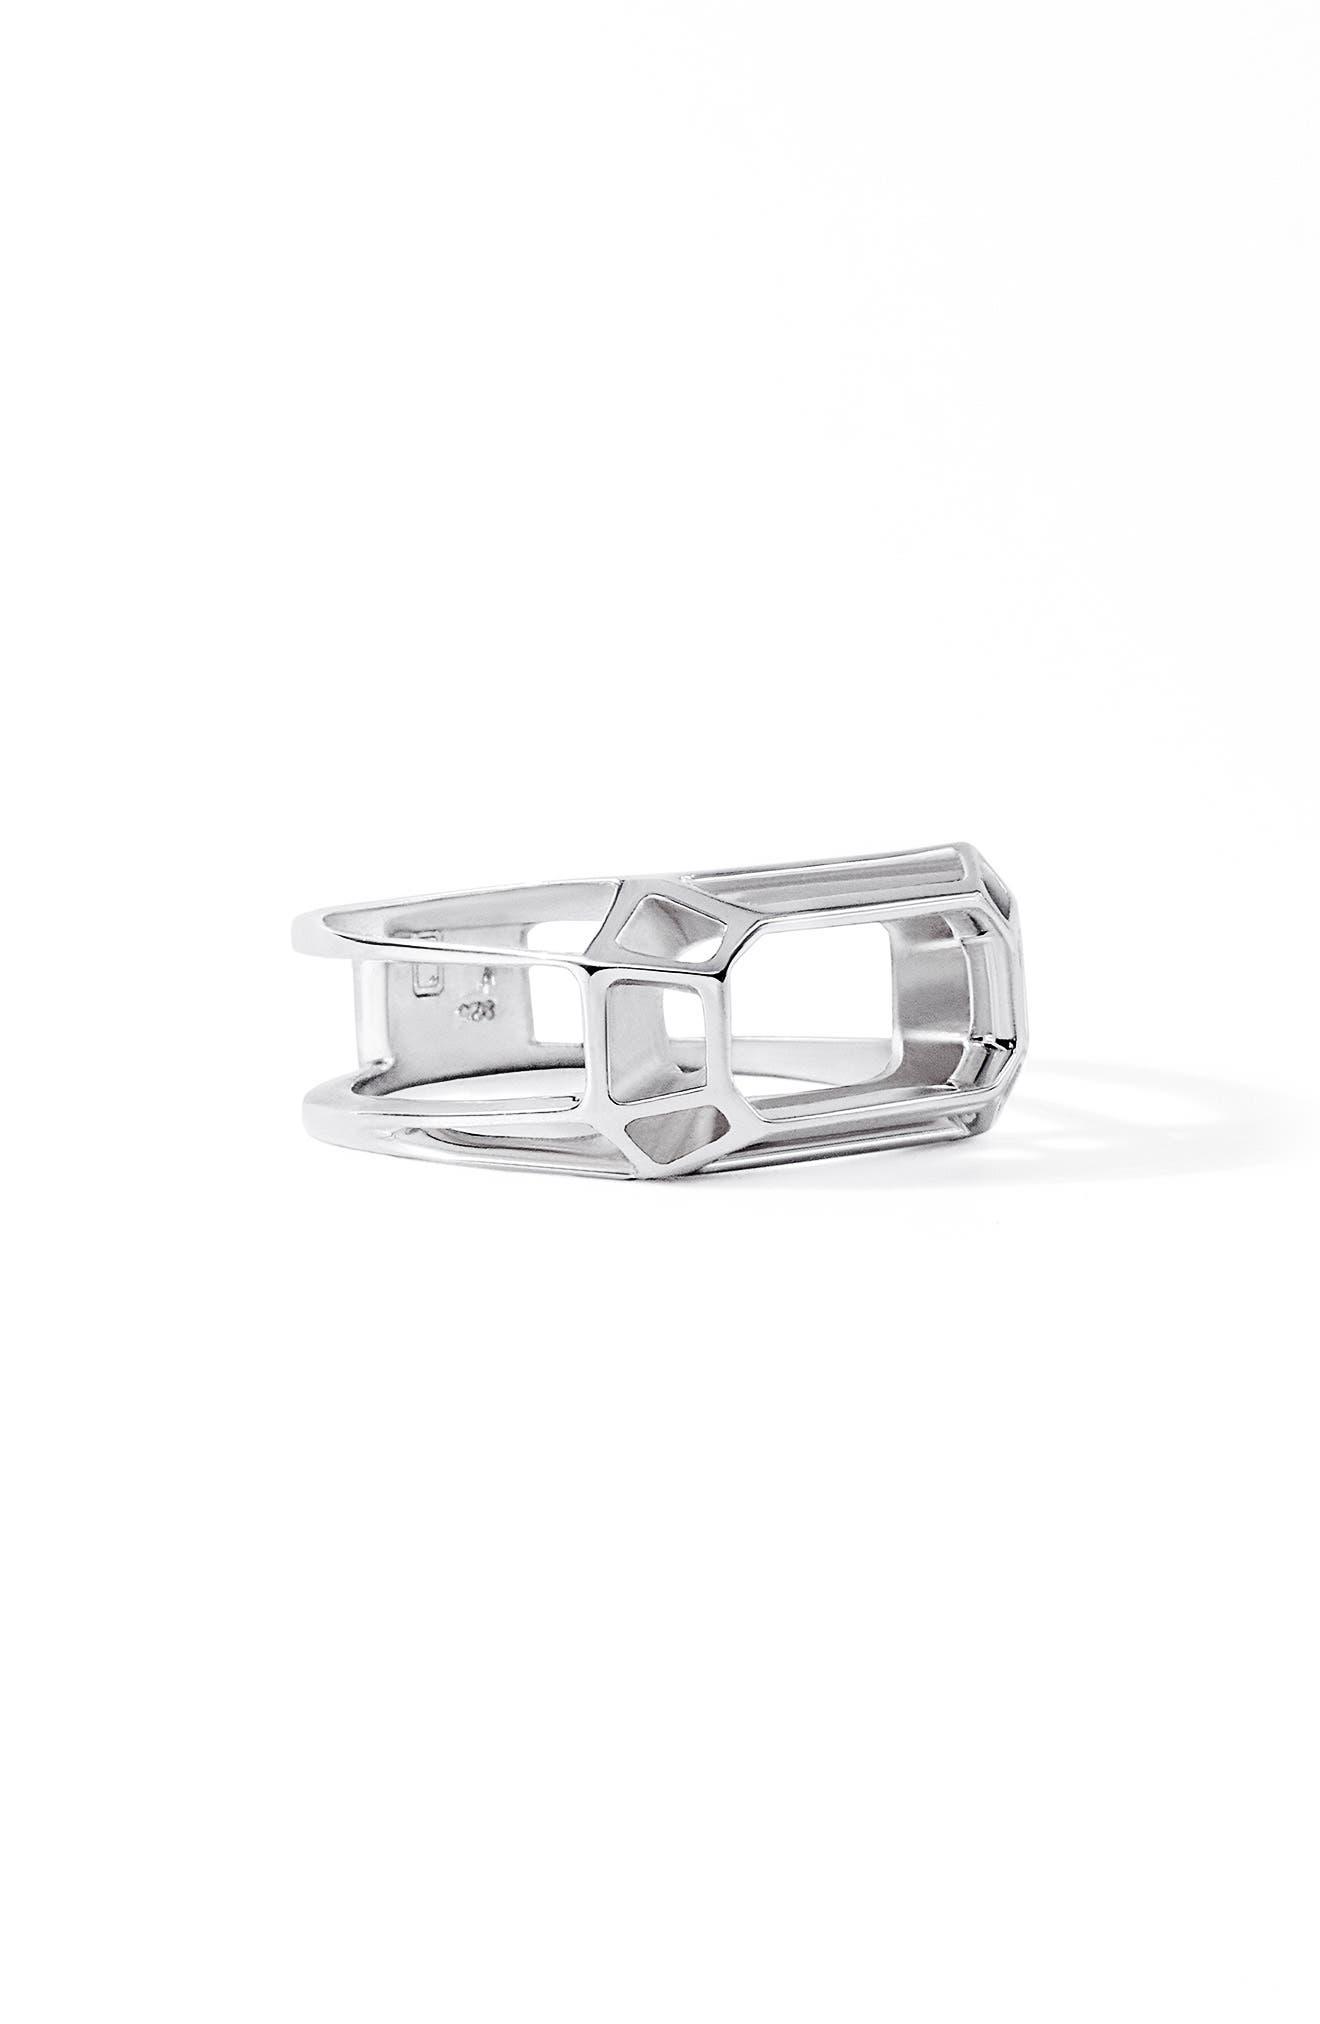 Jim Outline Sterling Silver Signet Ring